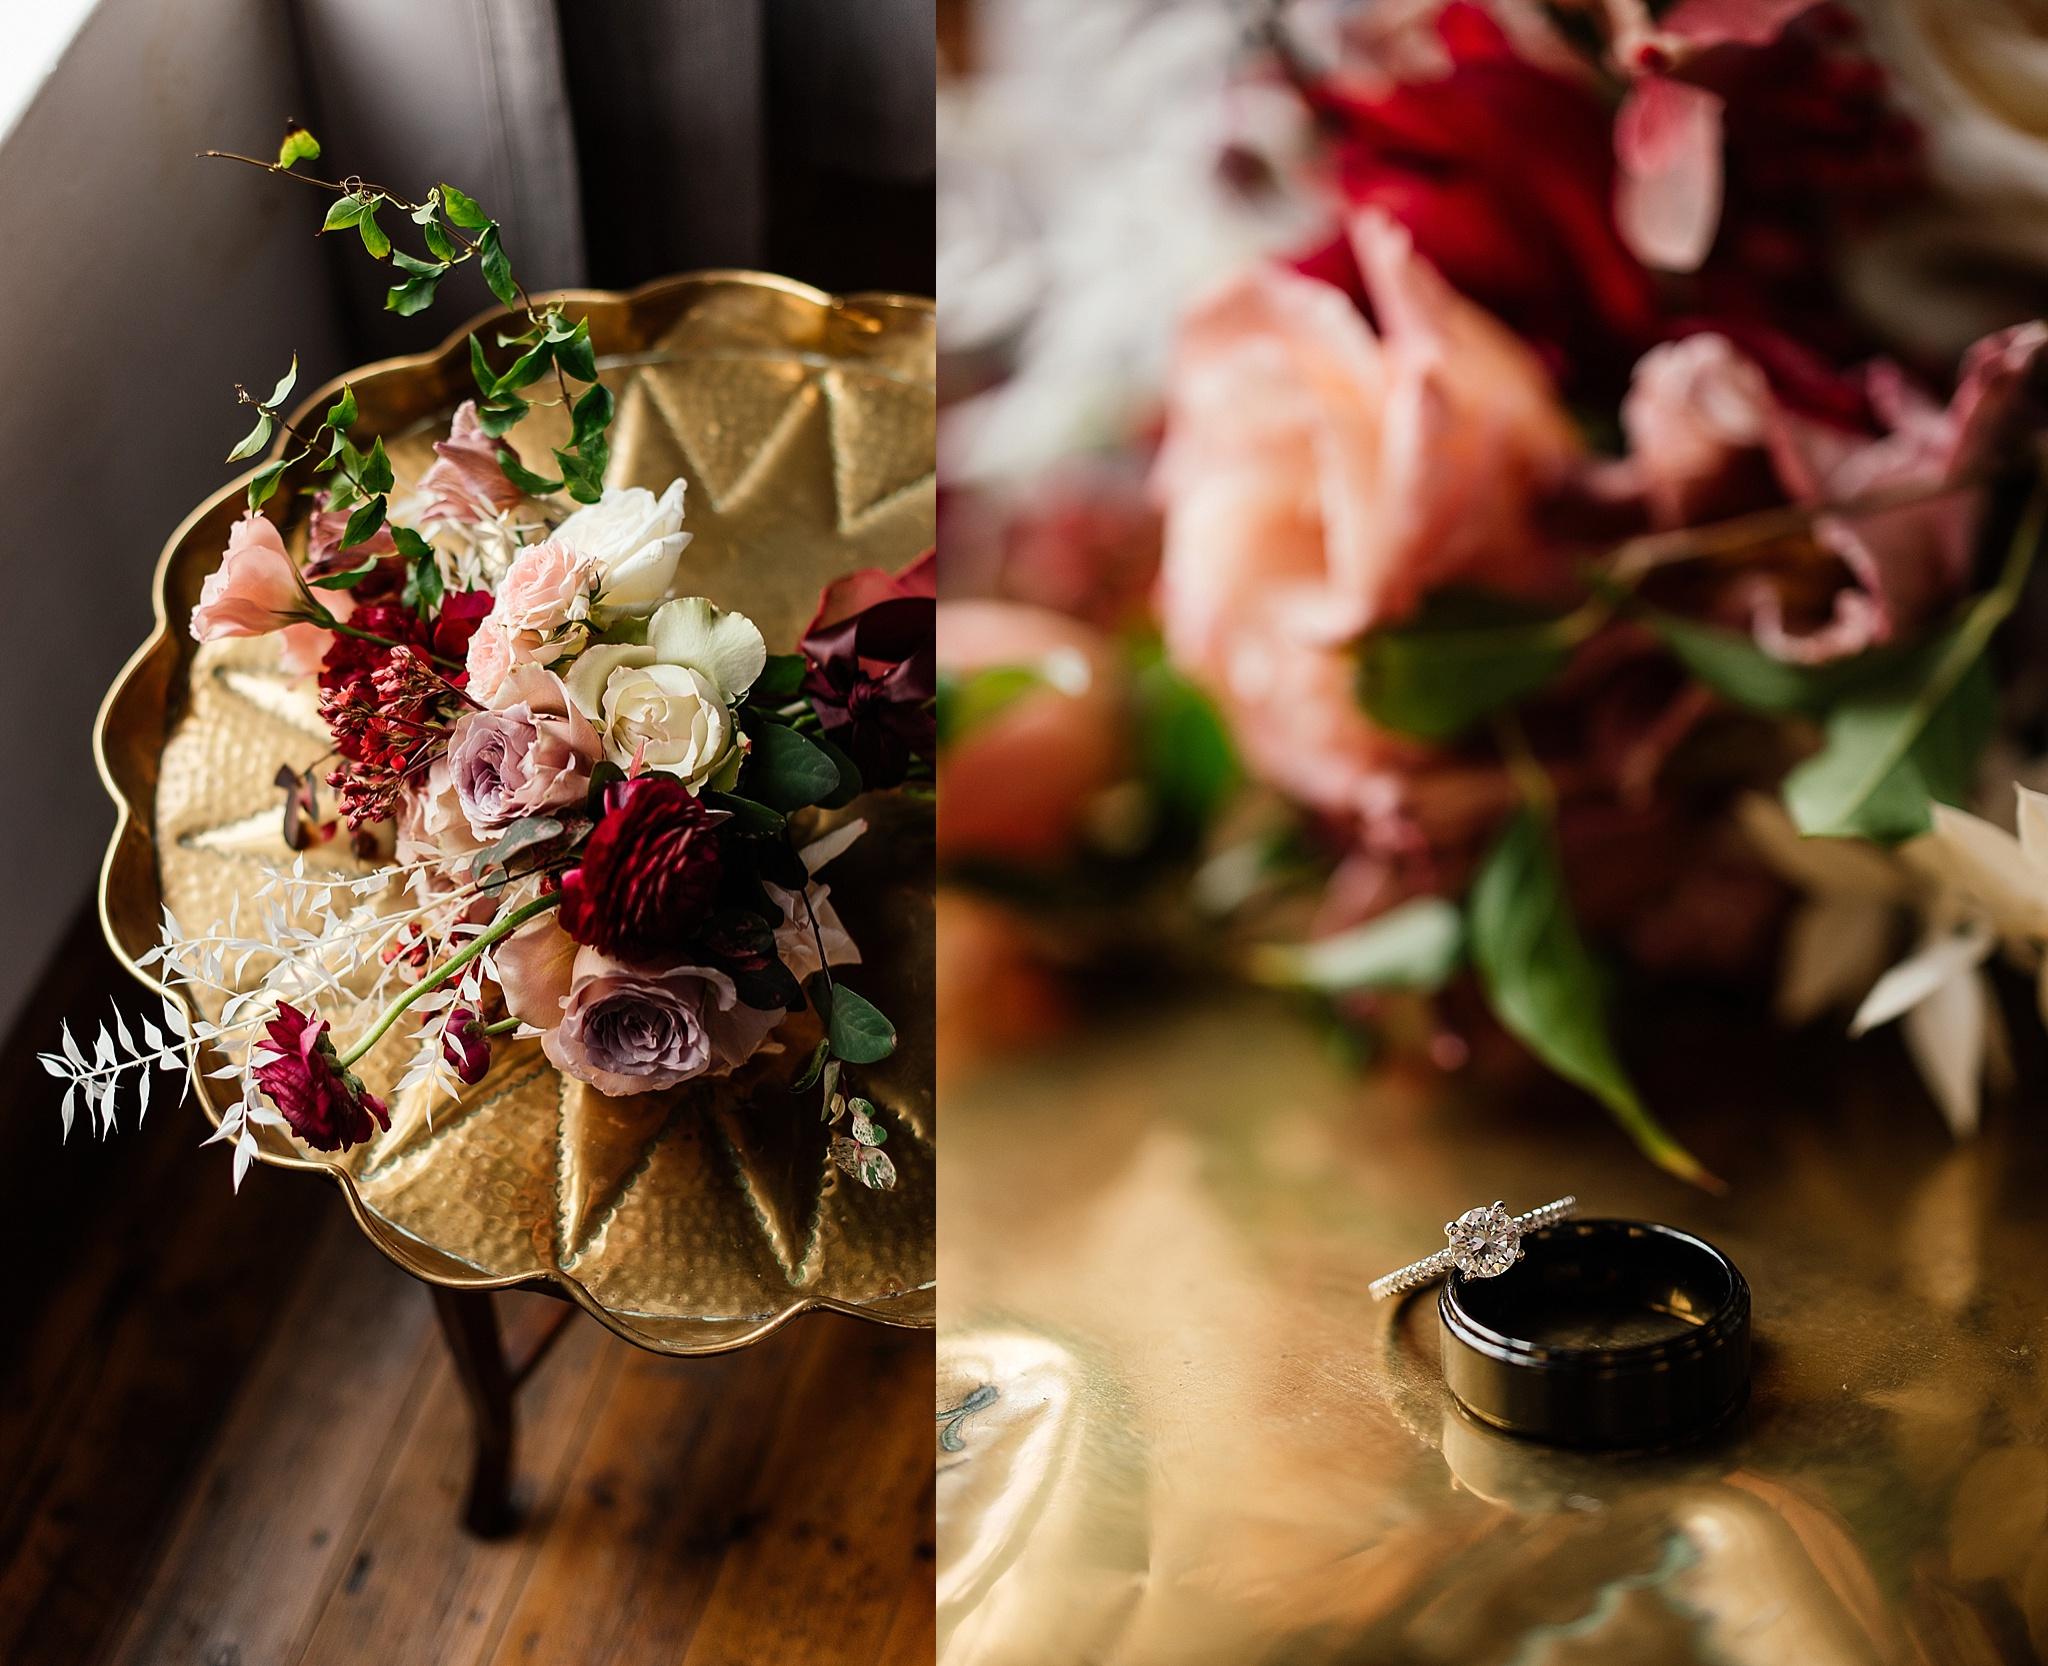 Cape Town Photographer Darren Bester - Die Woud Wedding - Gareth & Roxanne_0006.jpg